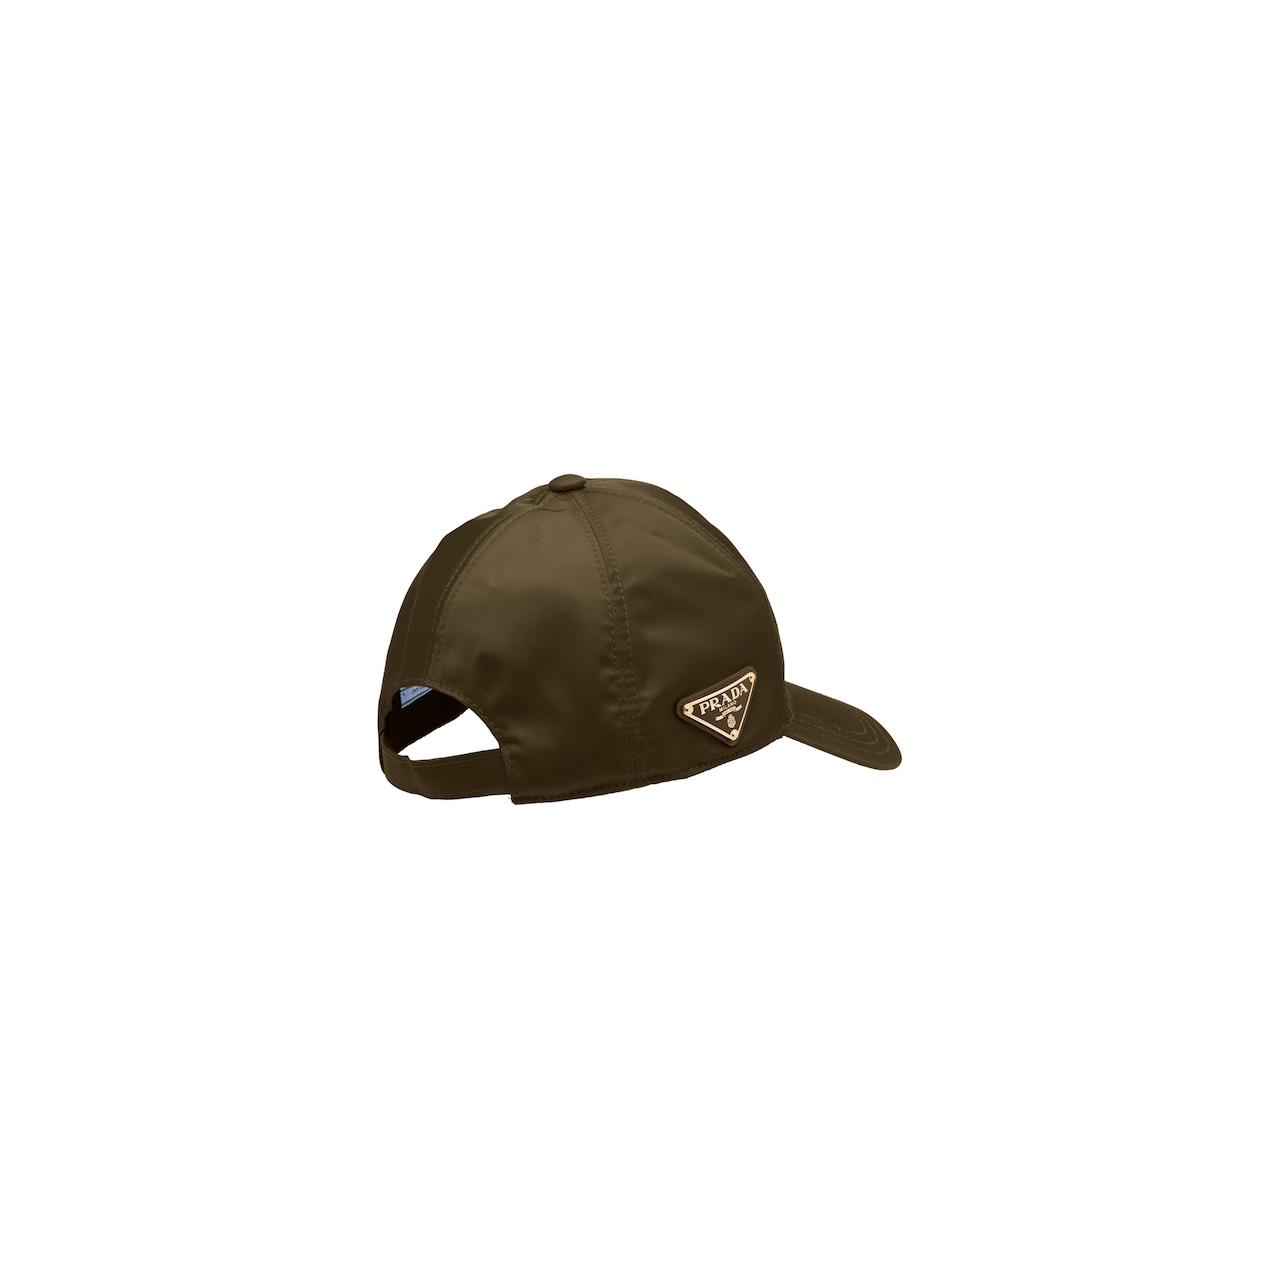 Prada 尼龙棒球帽 3